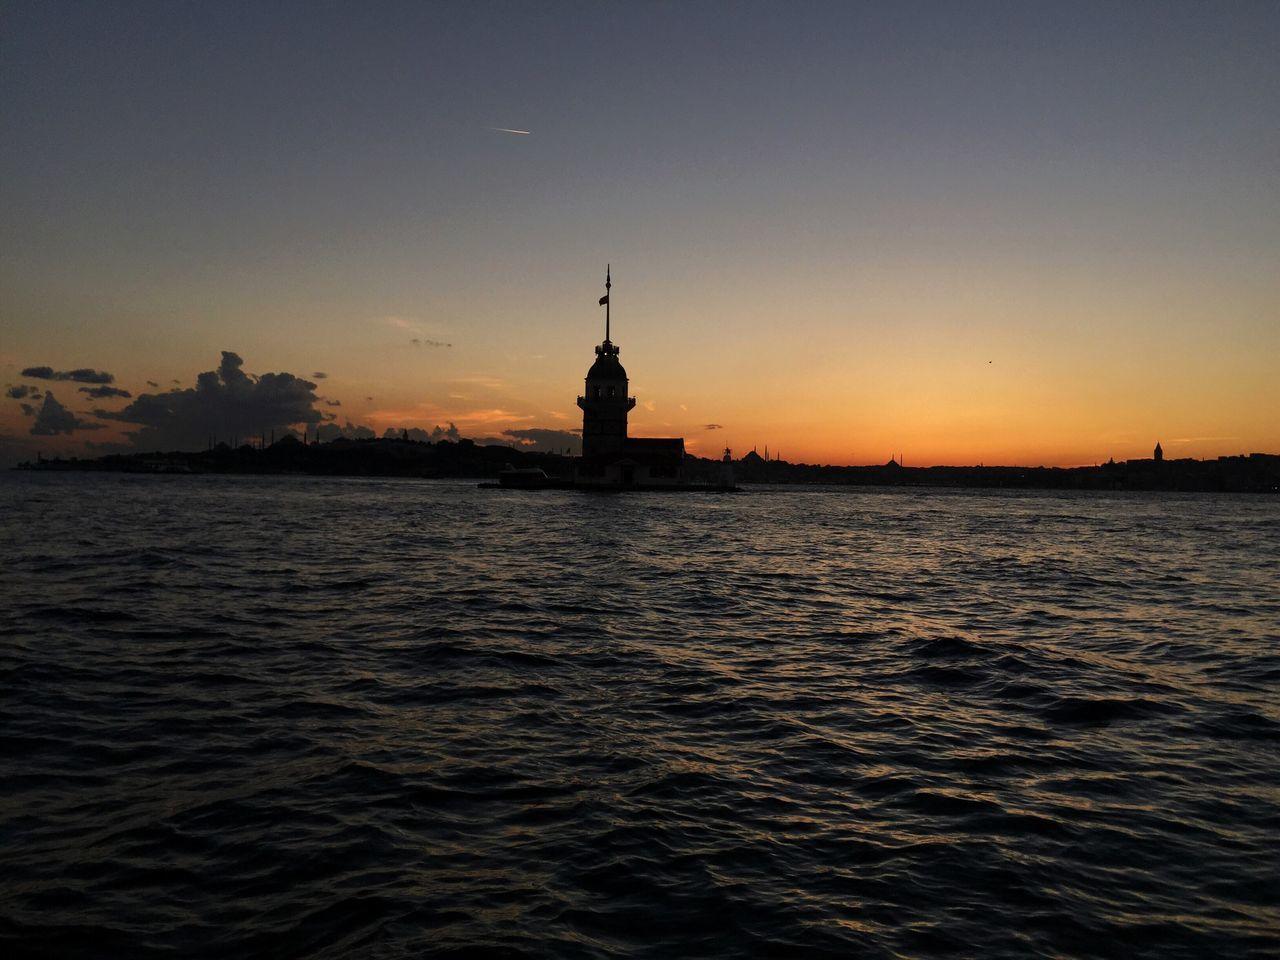 Building Exterior Sunset Tranquility No People Nature Sea Bosphorus Sundown Dawn Sky Silhouette Sun Tower Maiden Tower Maidenstower Maidentower Landmark Turkey Istanbul